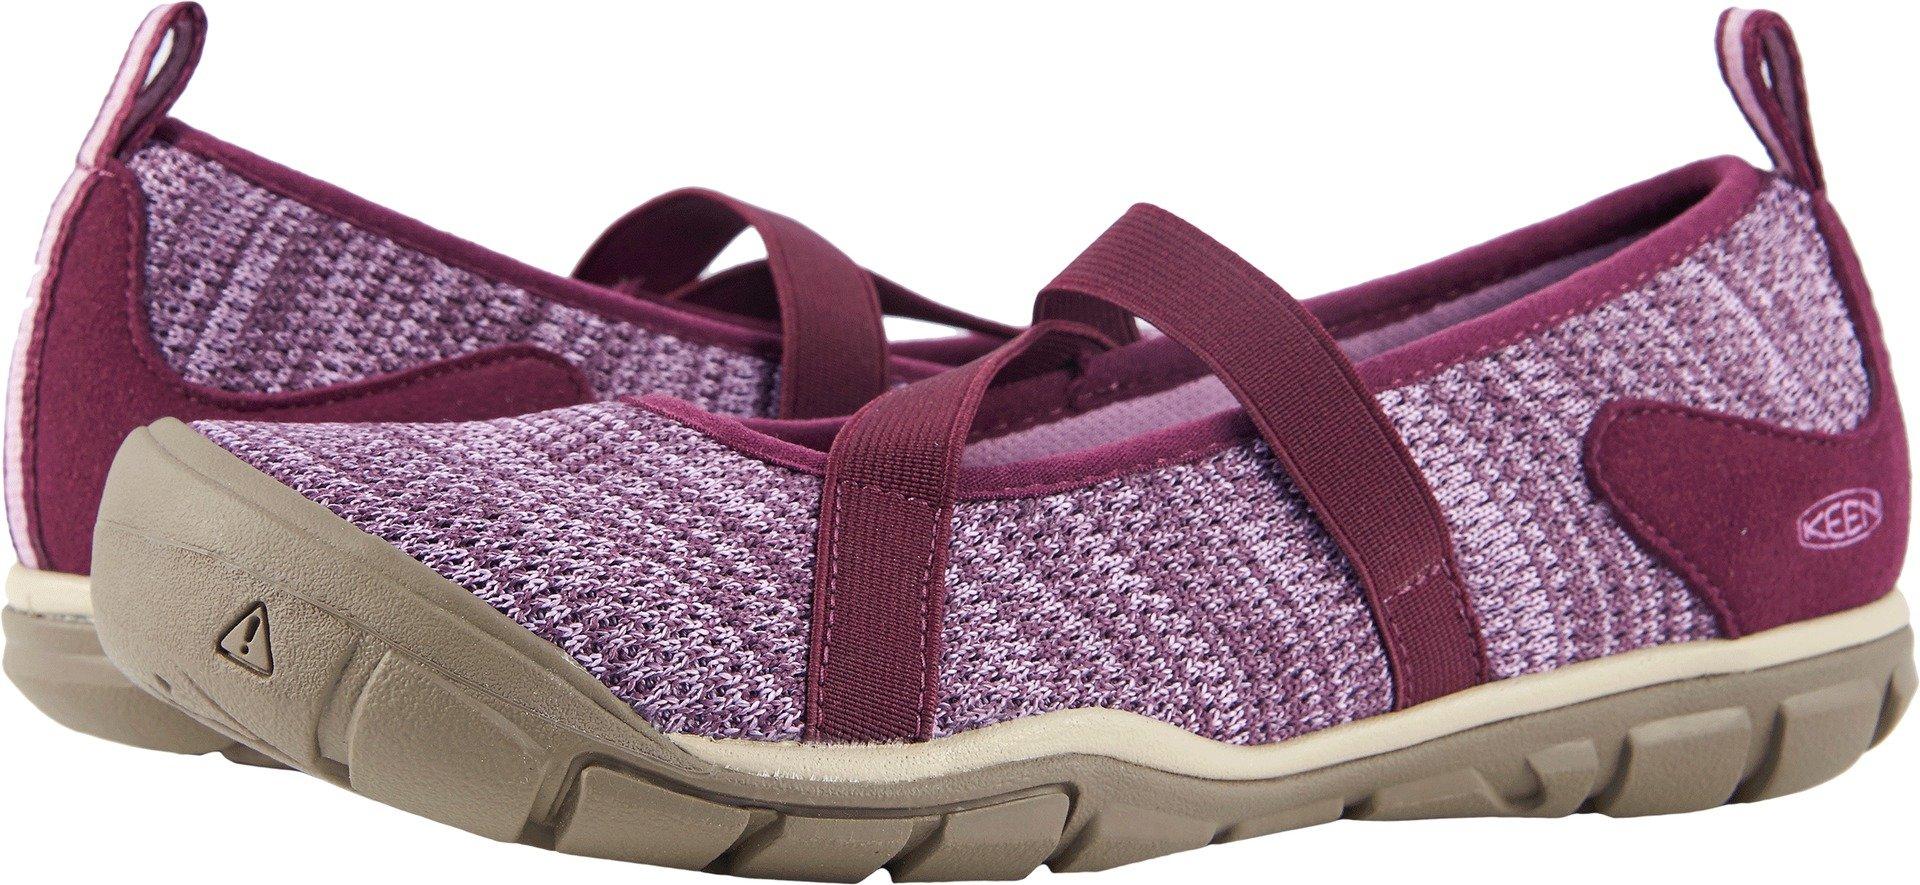 KEEN Women's Hush Knit MJ-W Hiking Shoe, Grape Wine/Lavender Herb, 7 M US